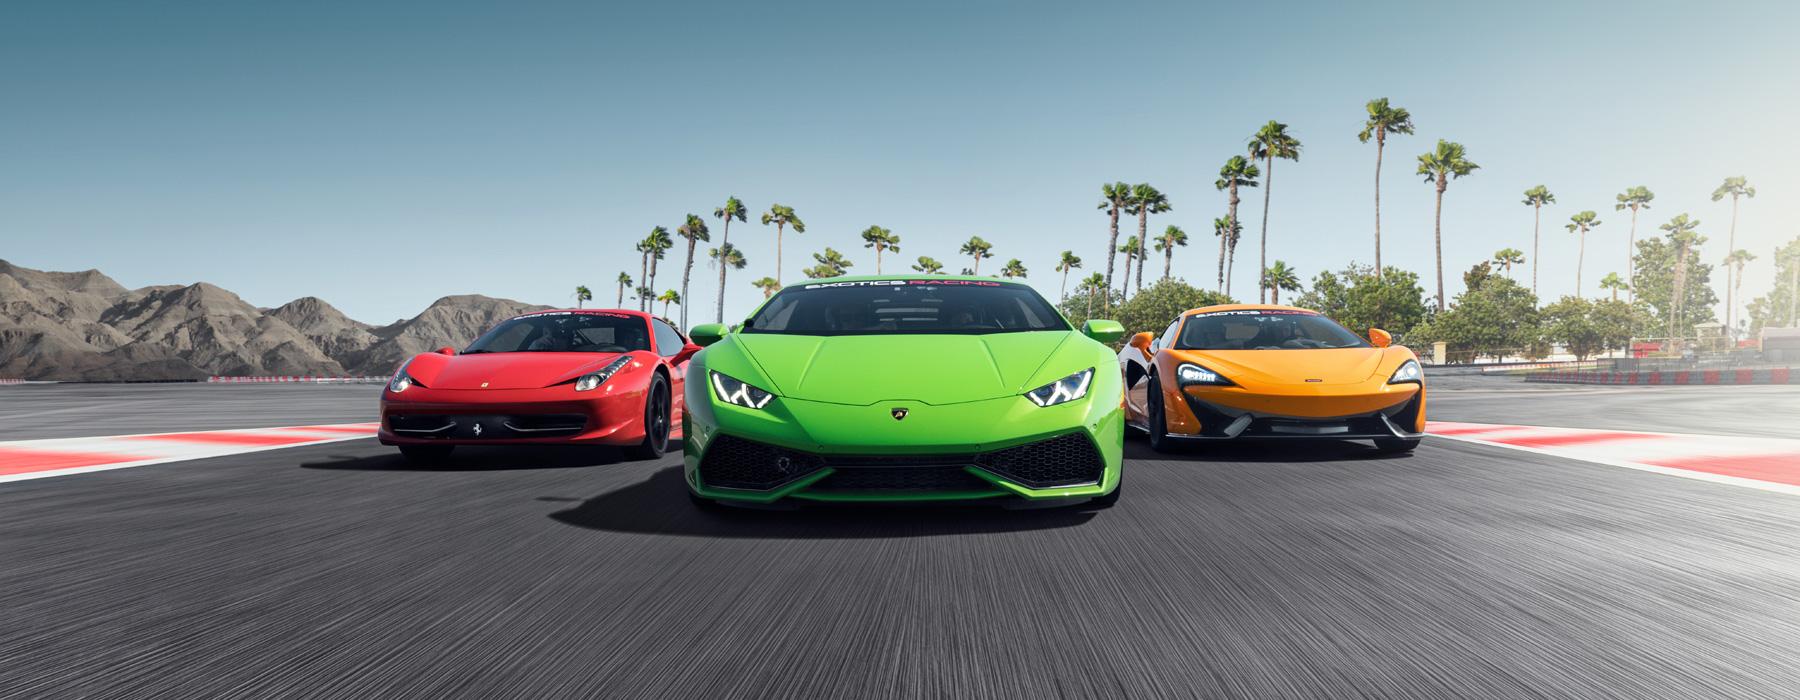 Lamborghini clipart supercar THE Angeles SUPERCARS BEST Experiences